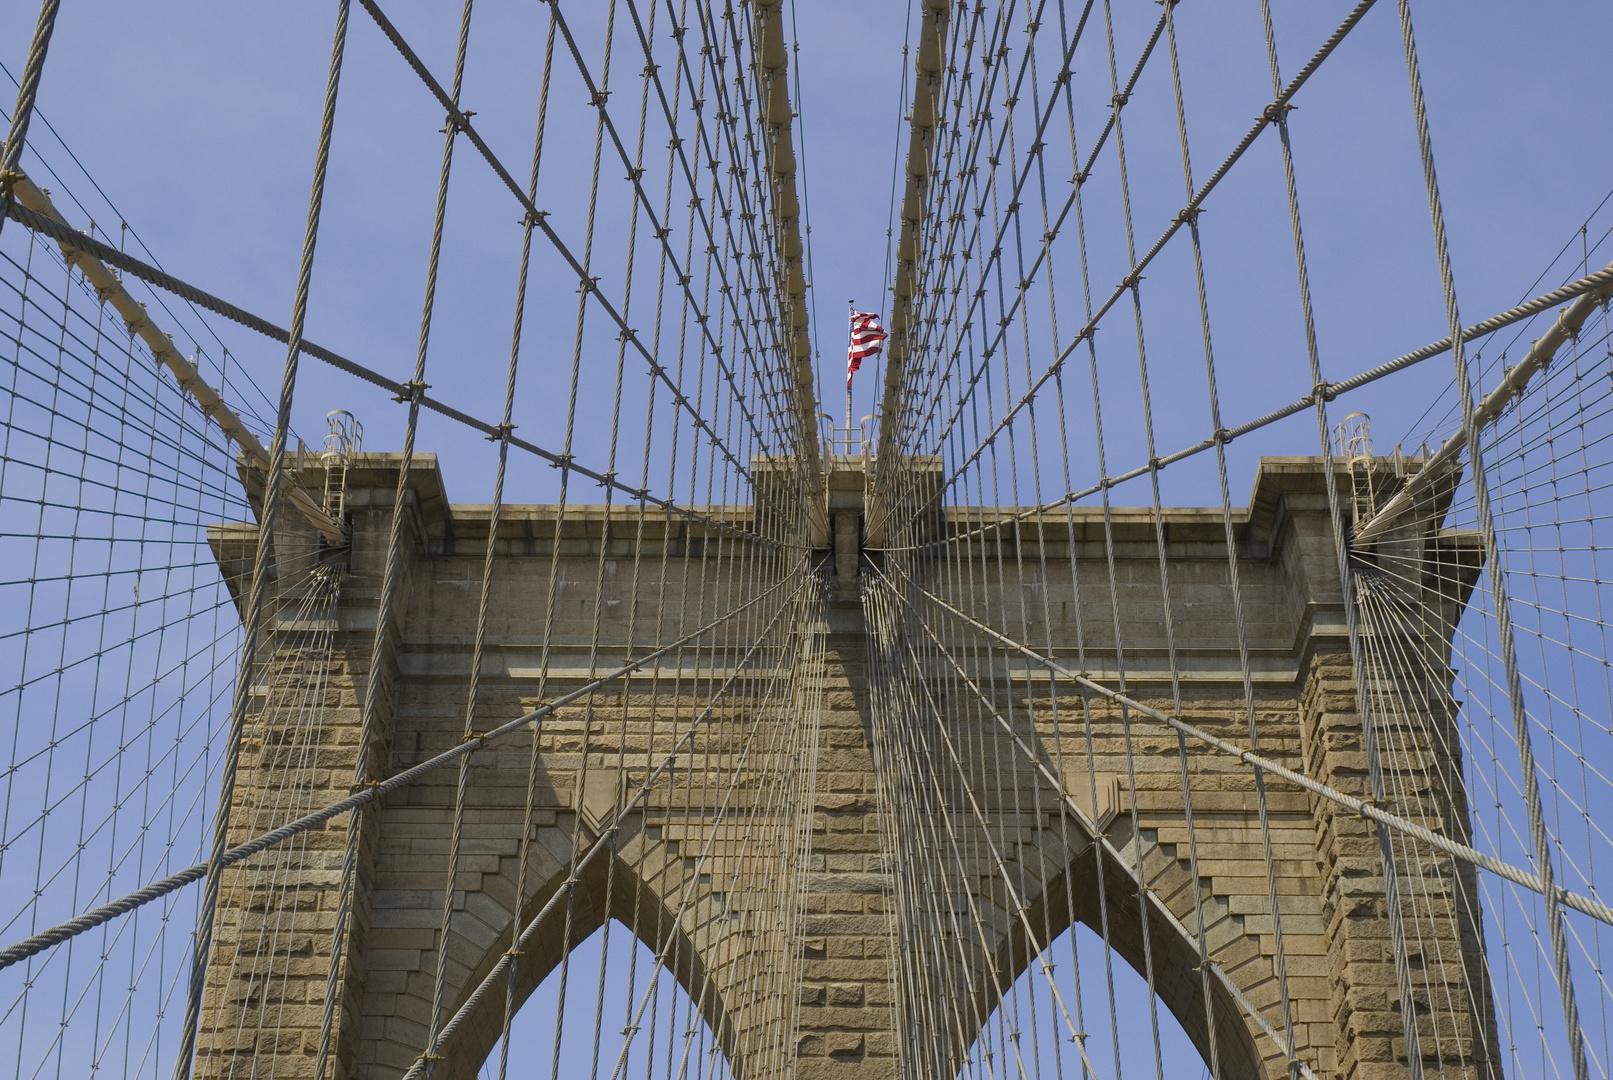 New York - Brooklyn Brdige